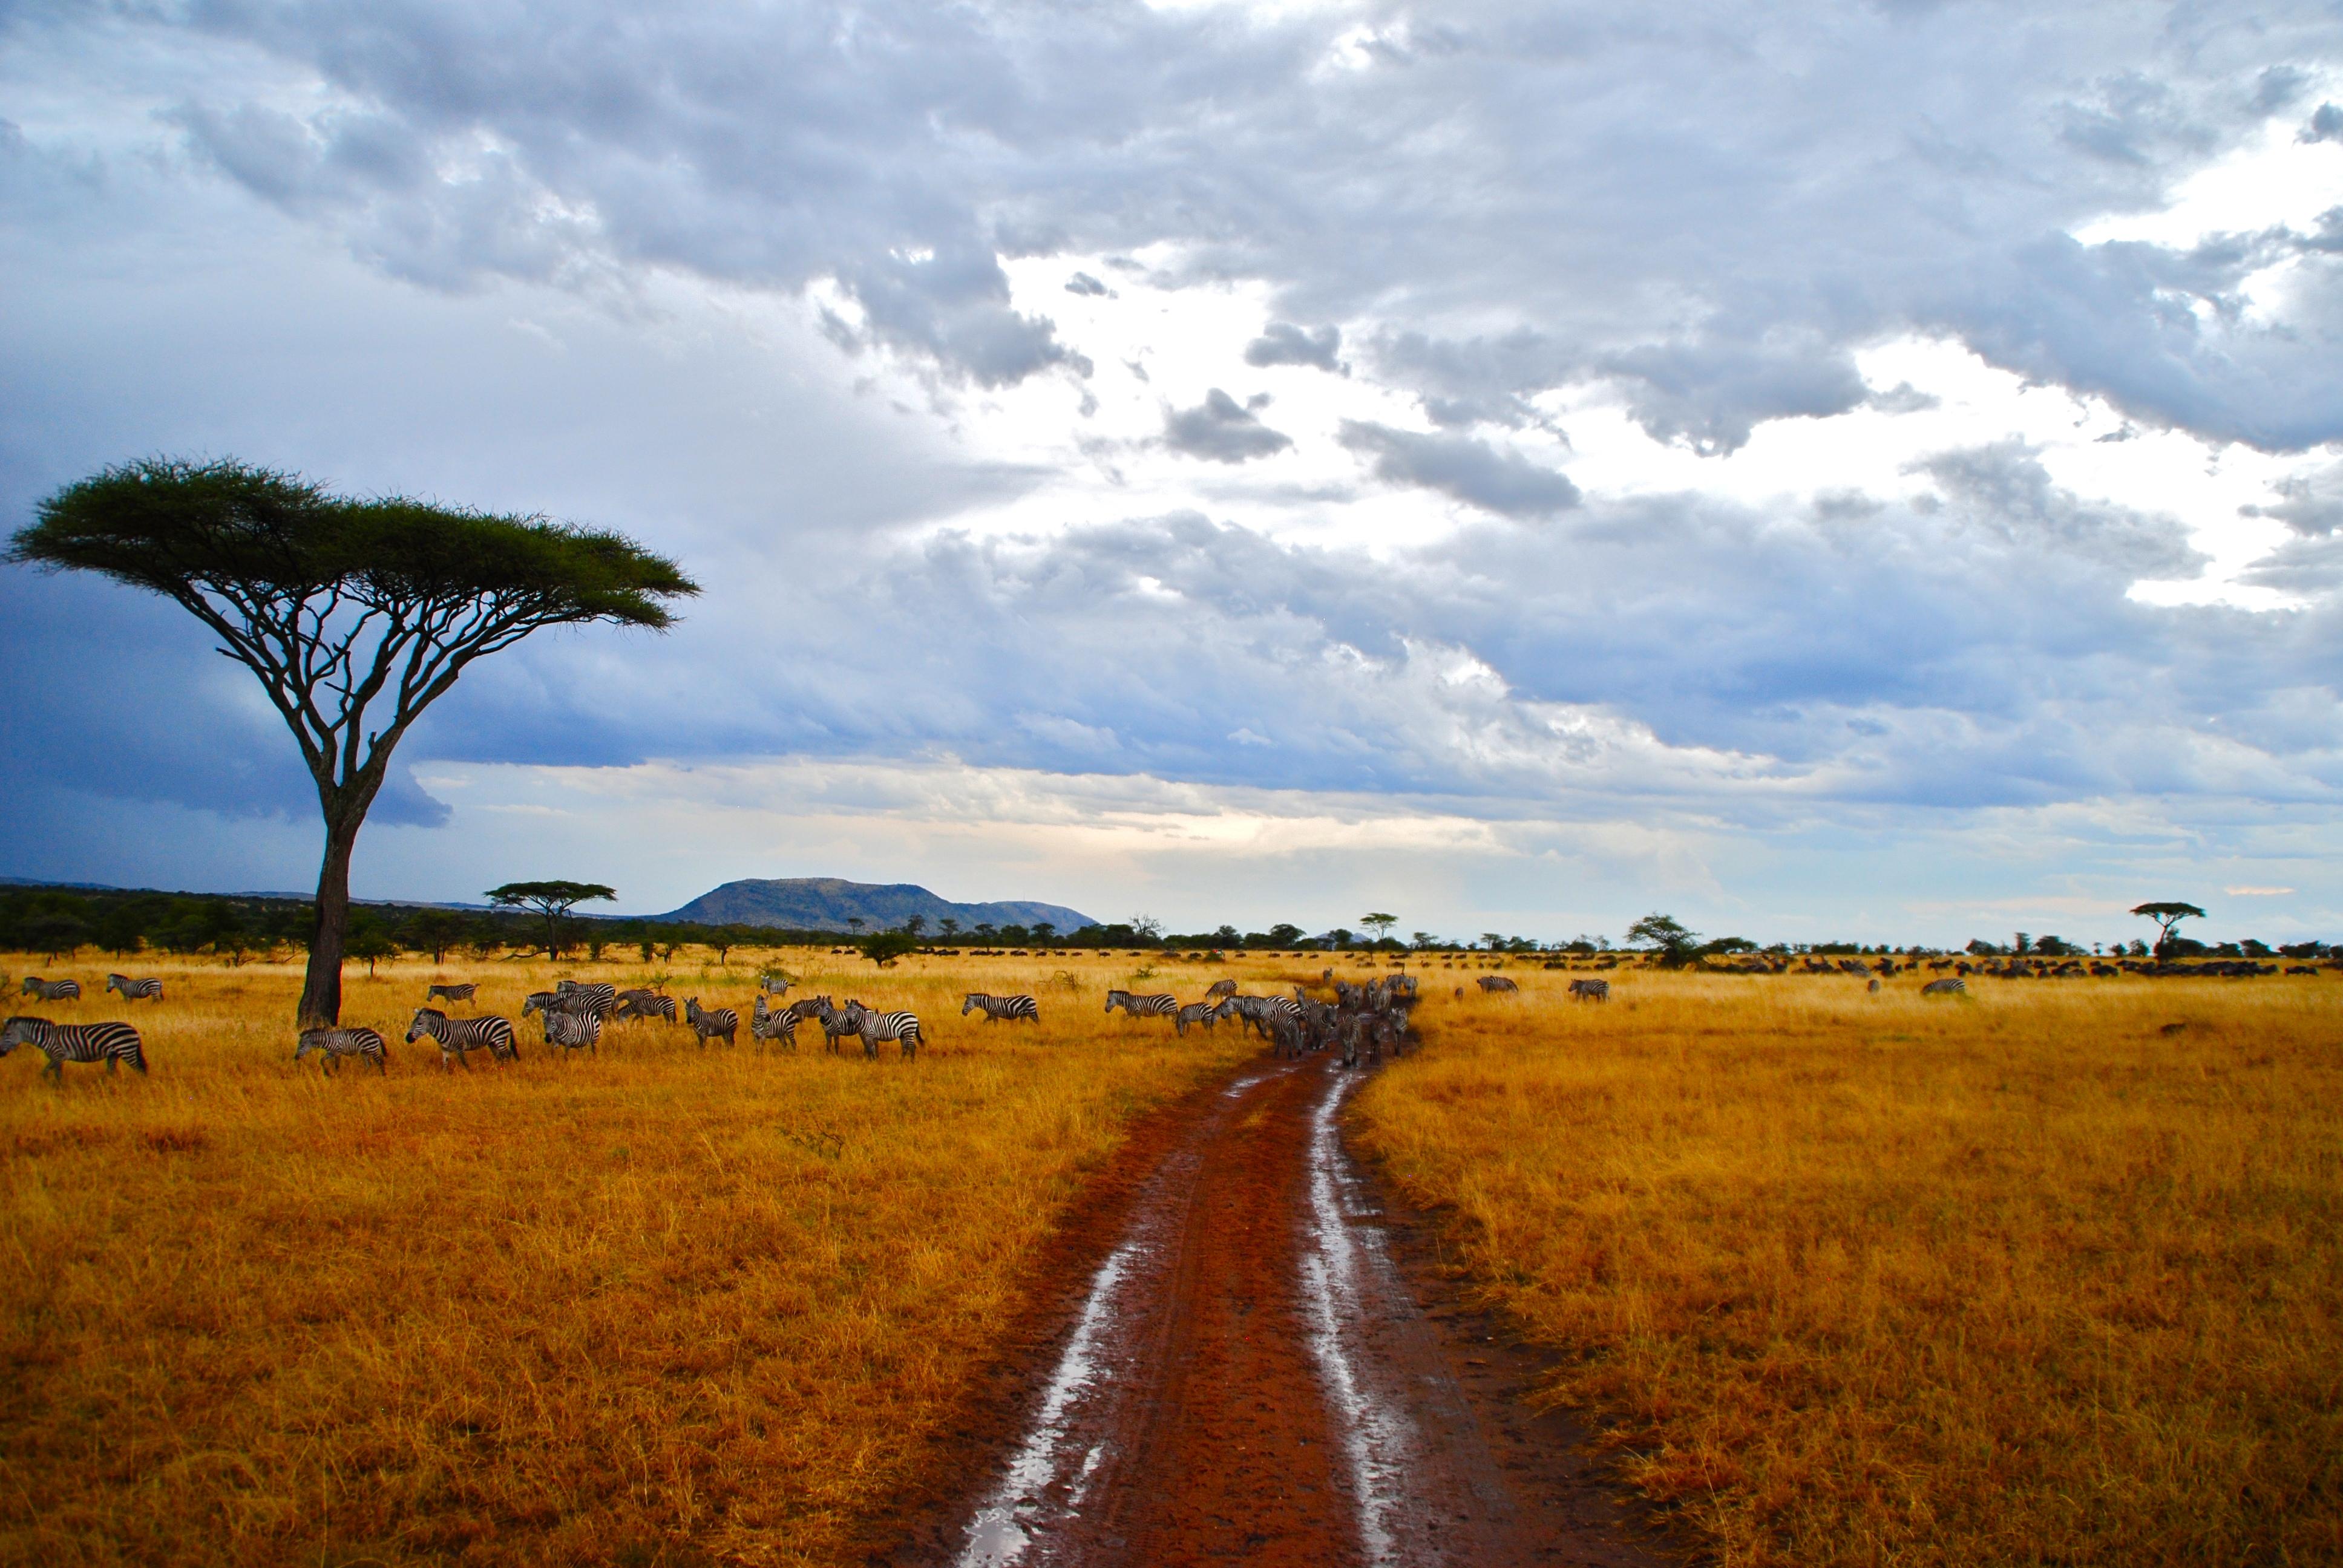 Adventure in Africa ~ part 1 Safari February 2012 | tranquility safari